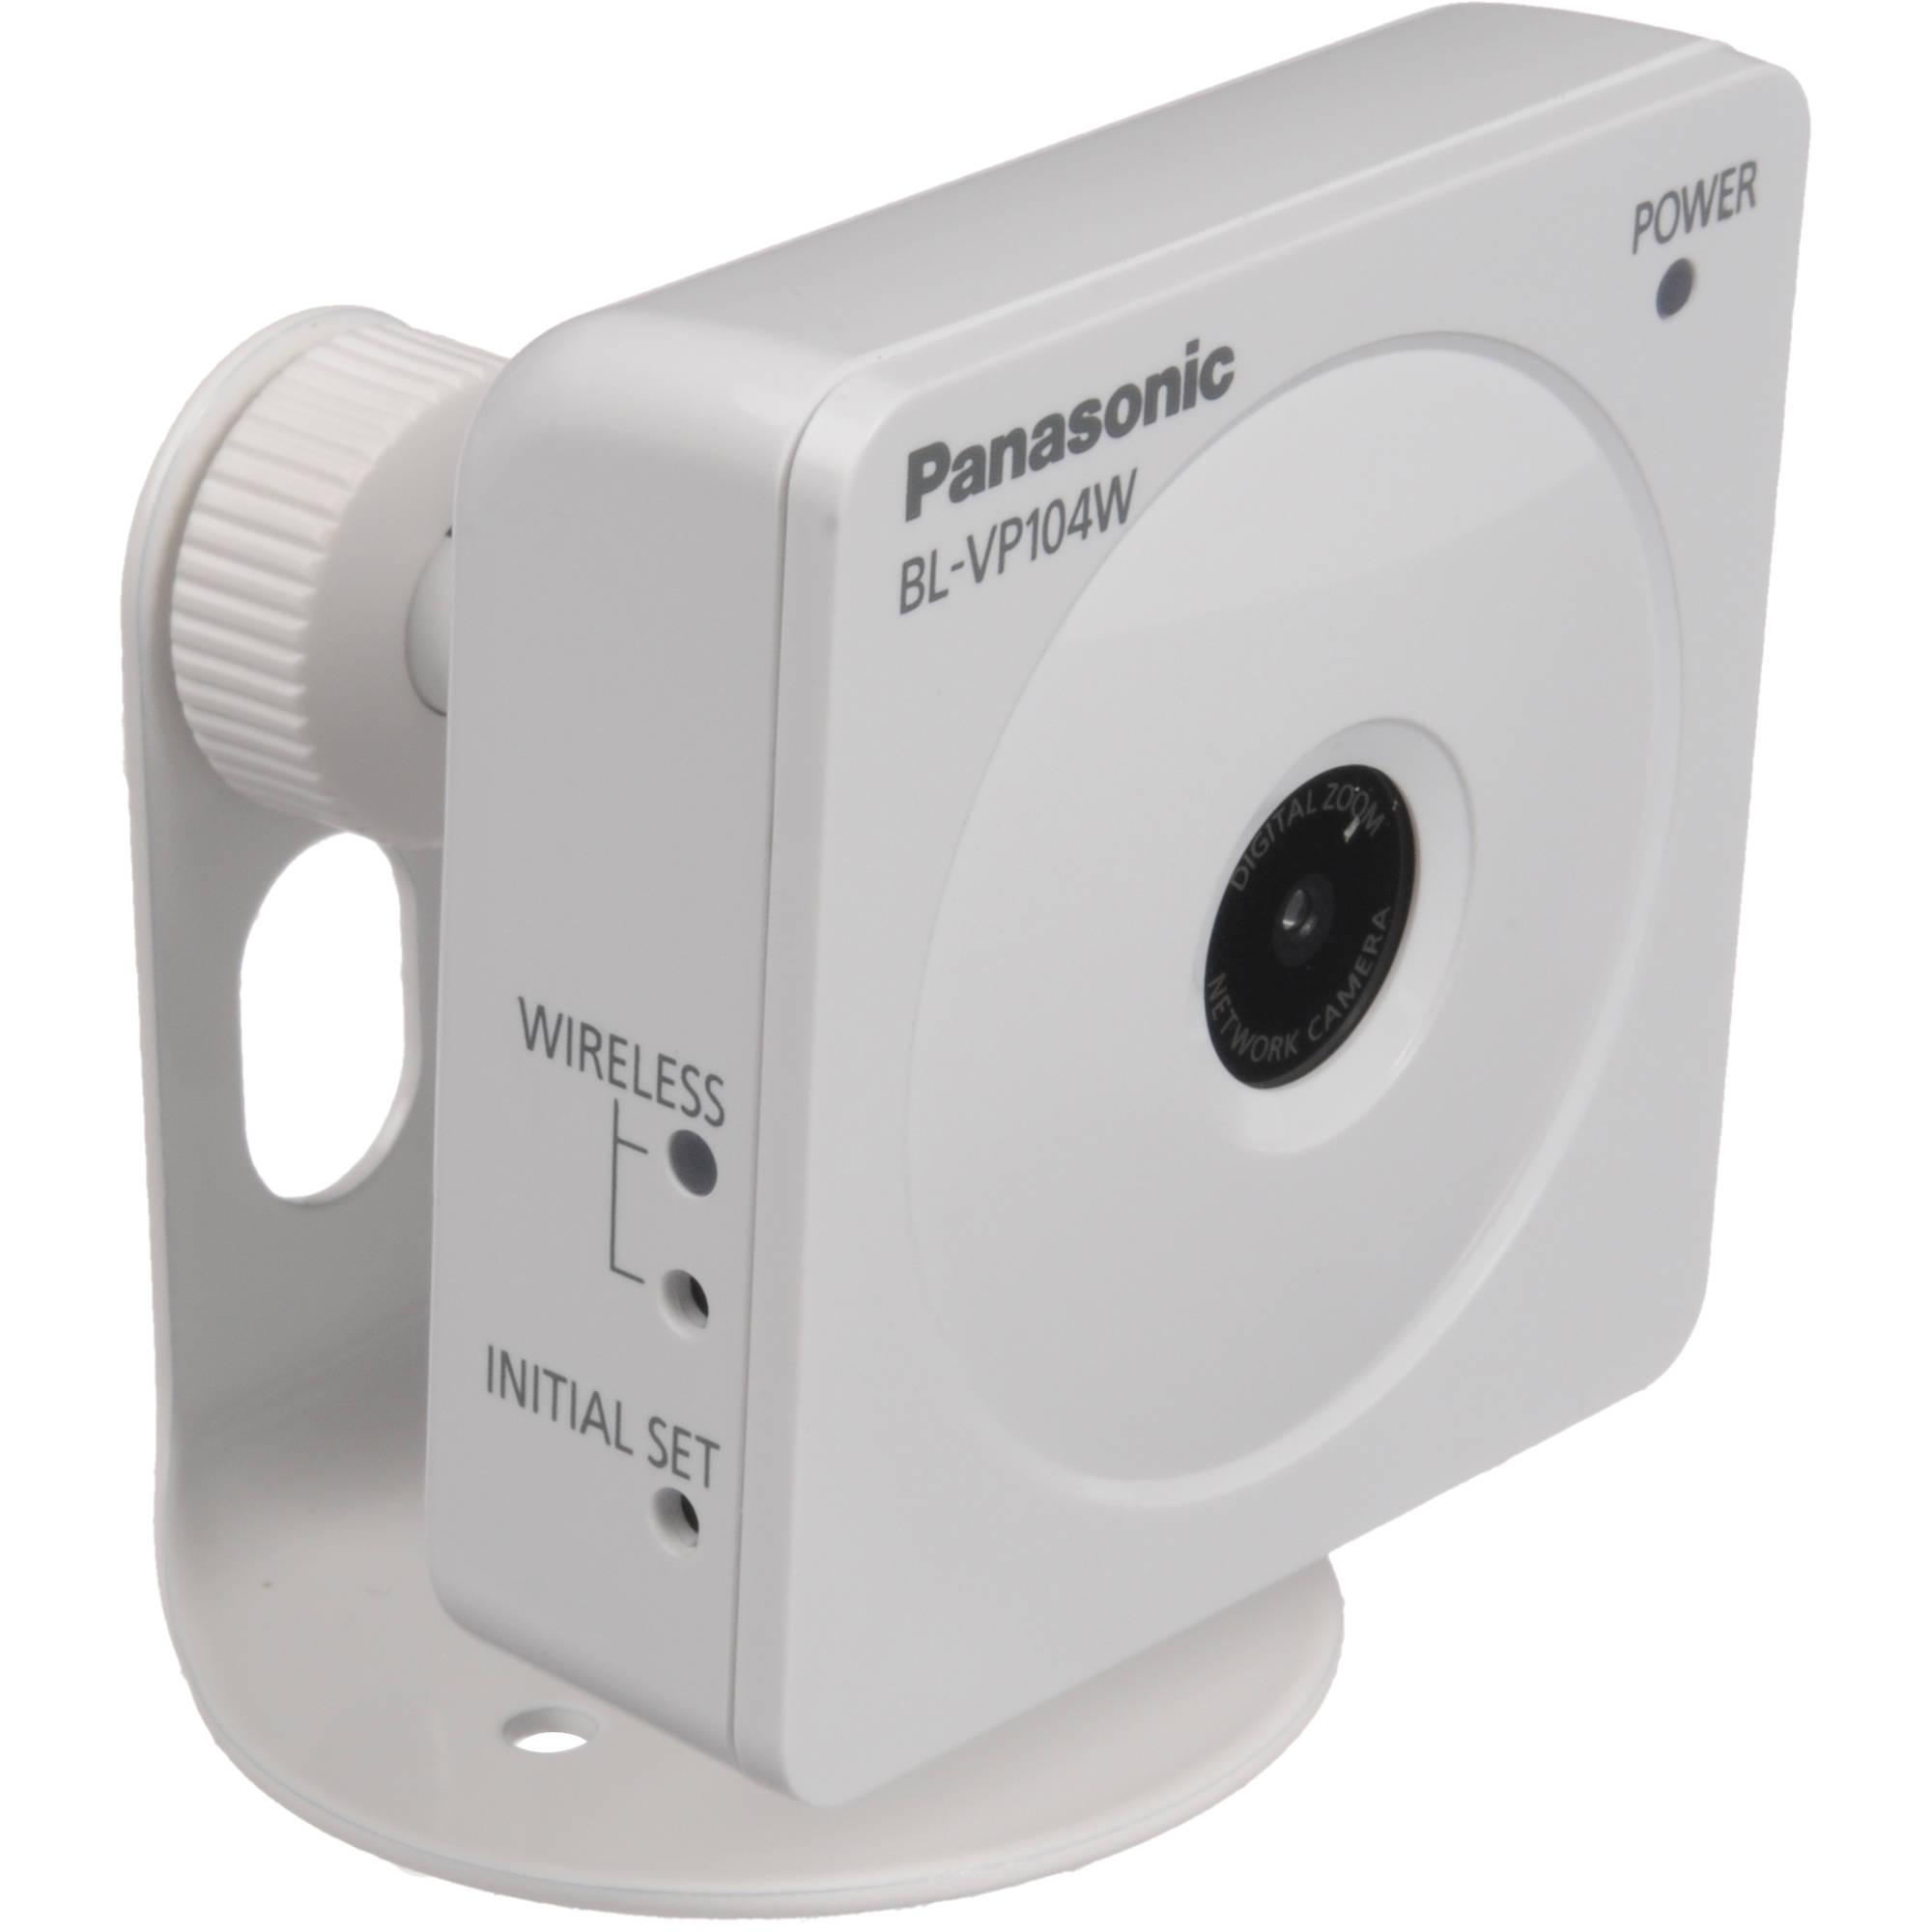 Driver for Panasonic BL-VP104 Network Camera